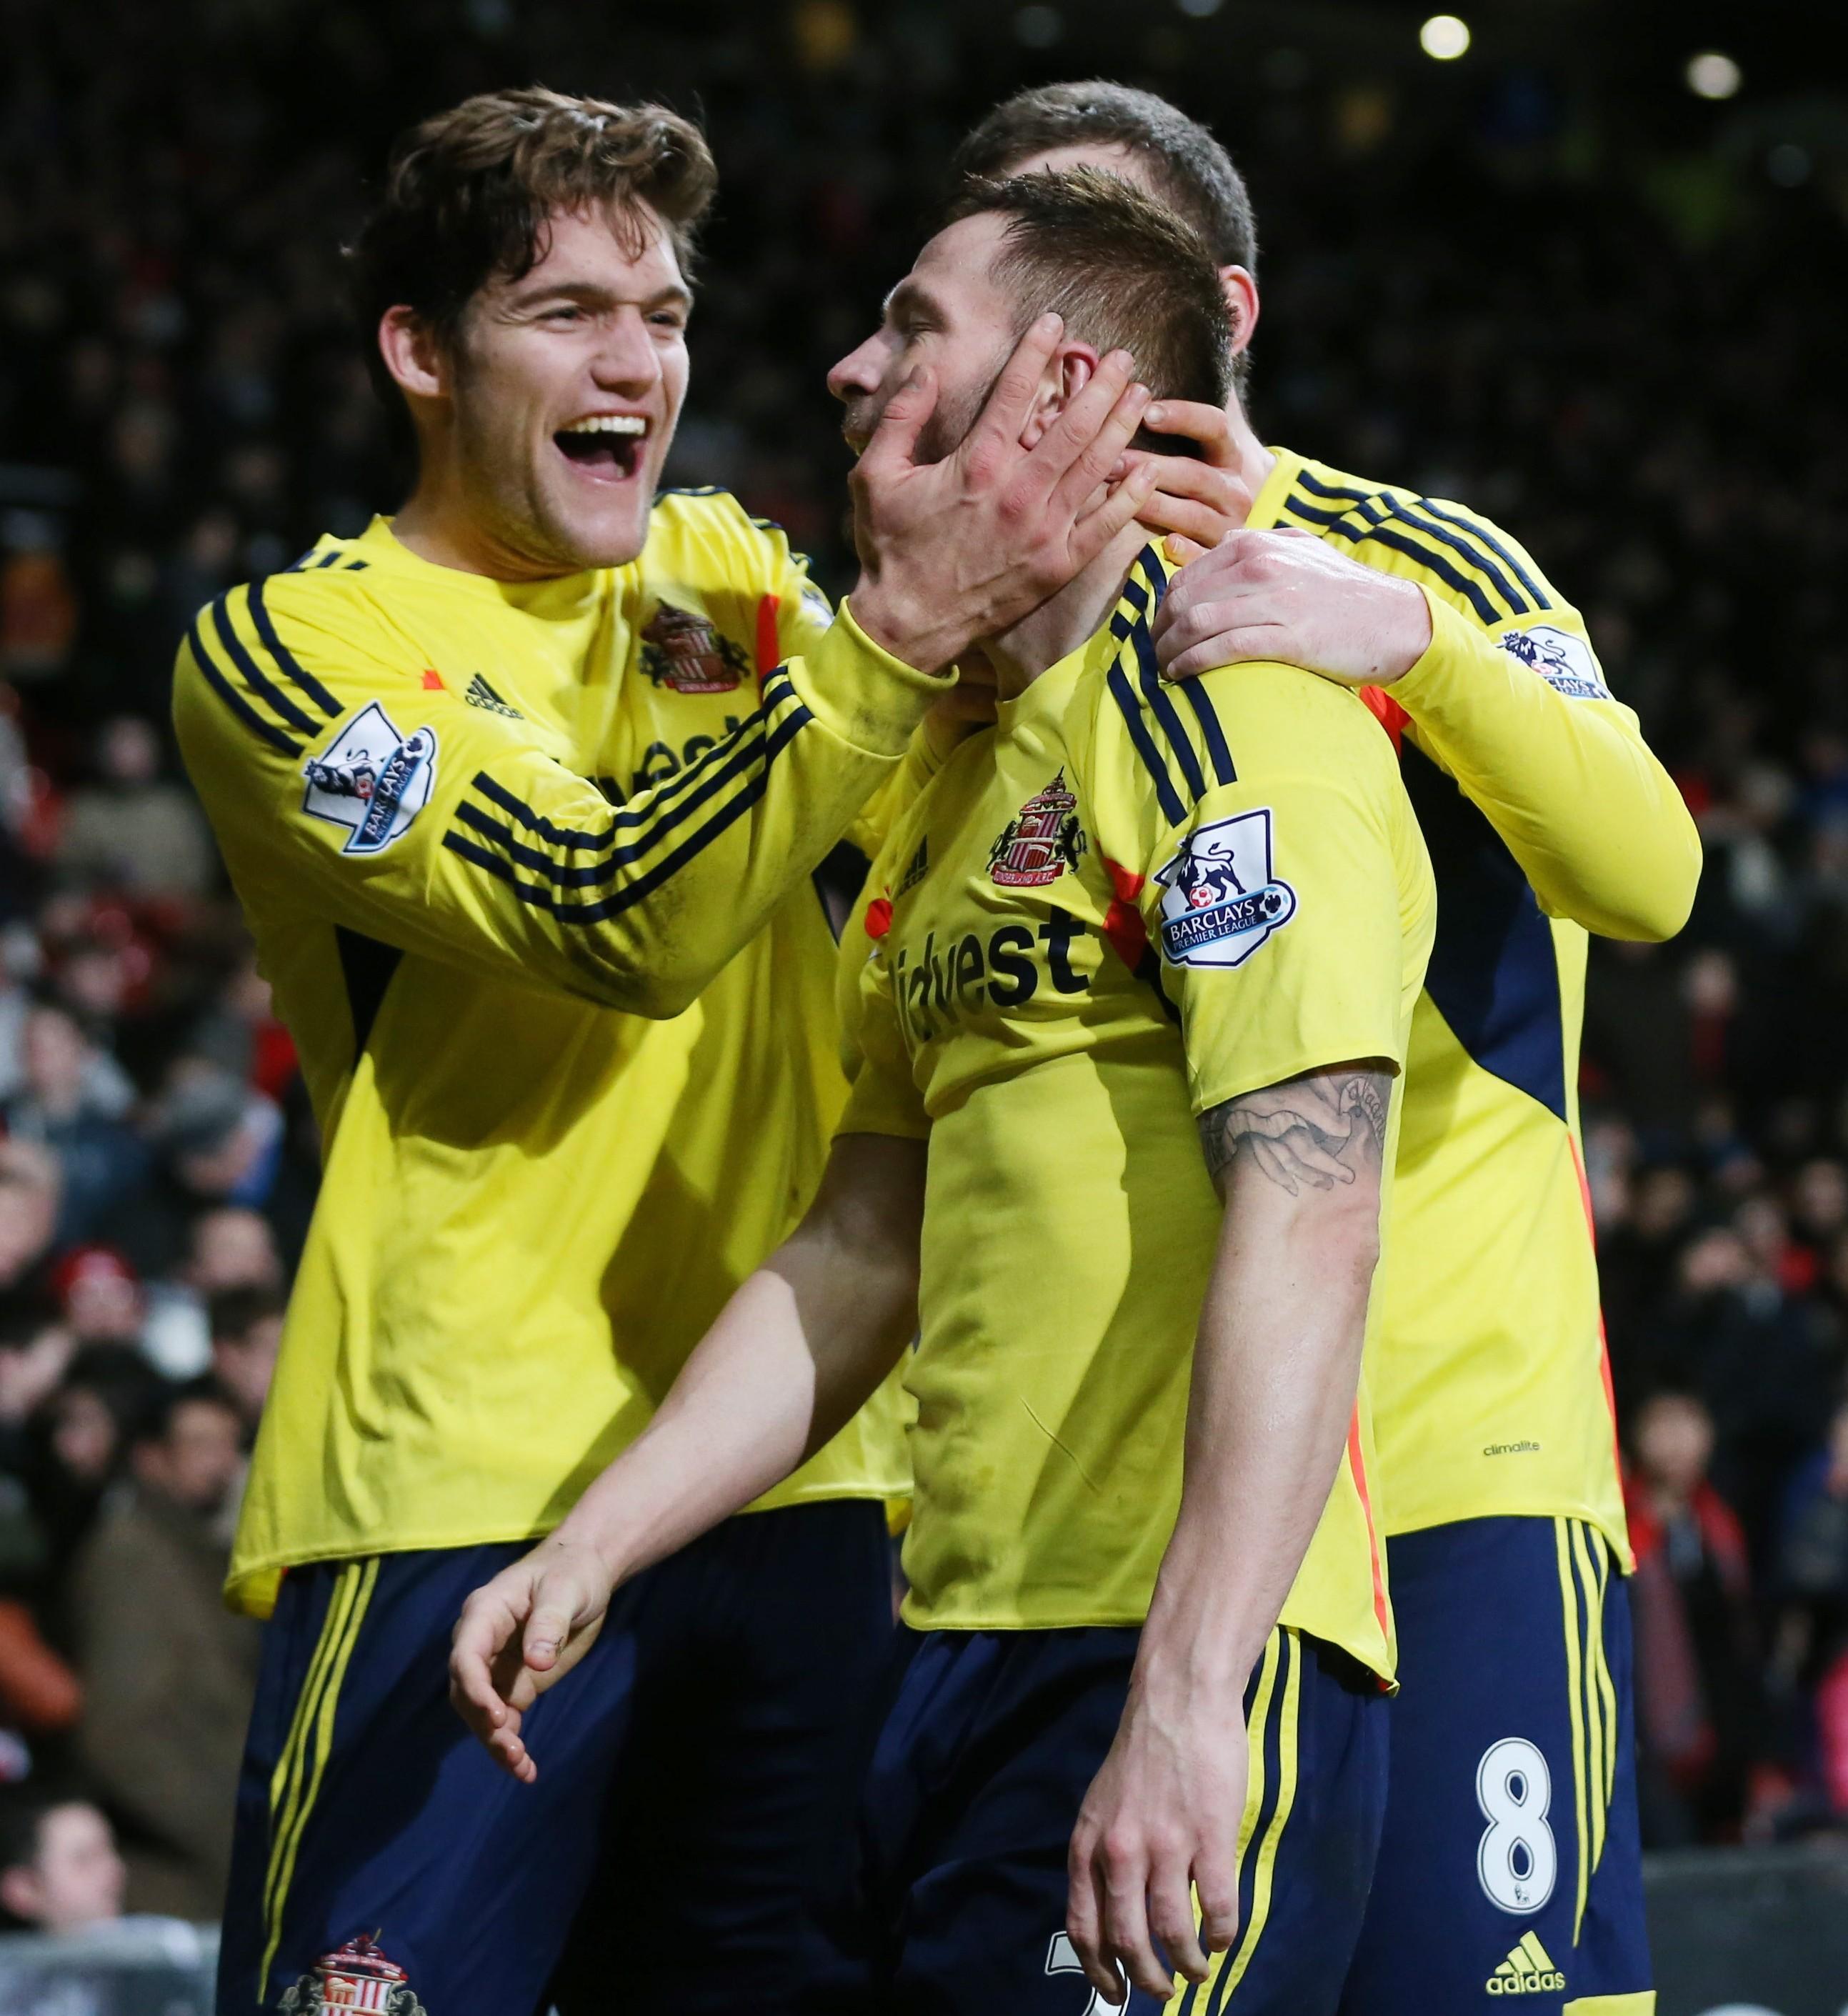 Manchester United v Sunderland - Capital One Cup Semi Final Second Leg